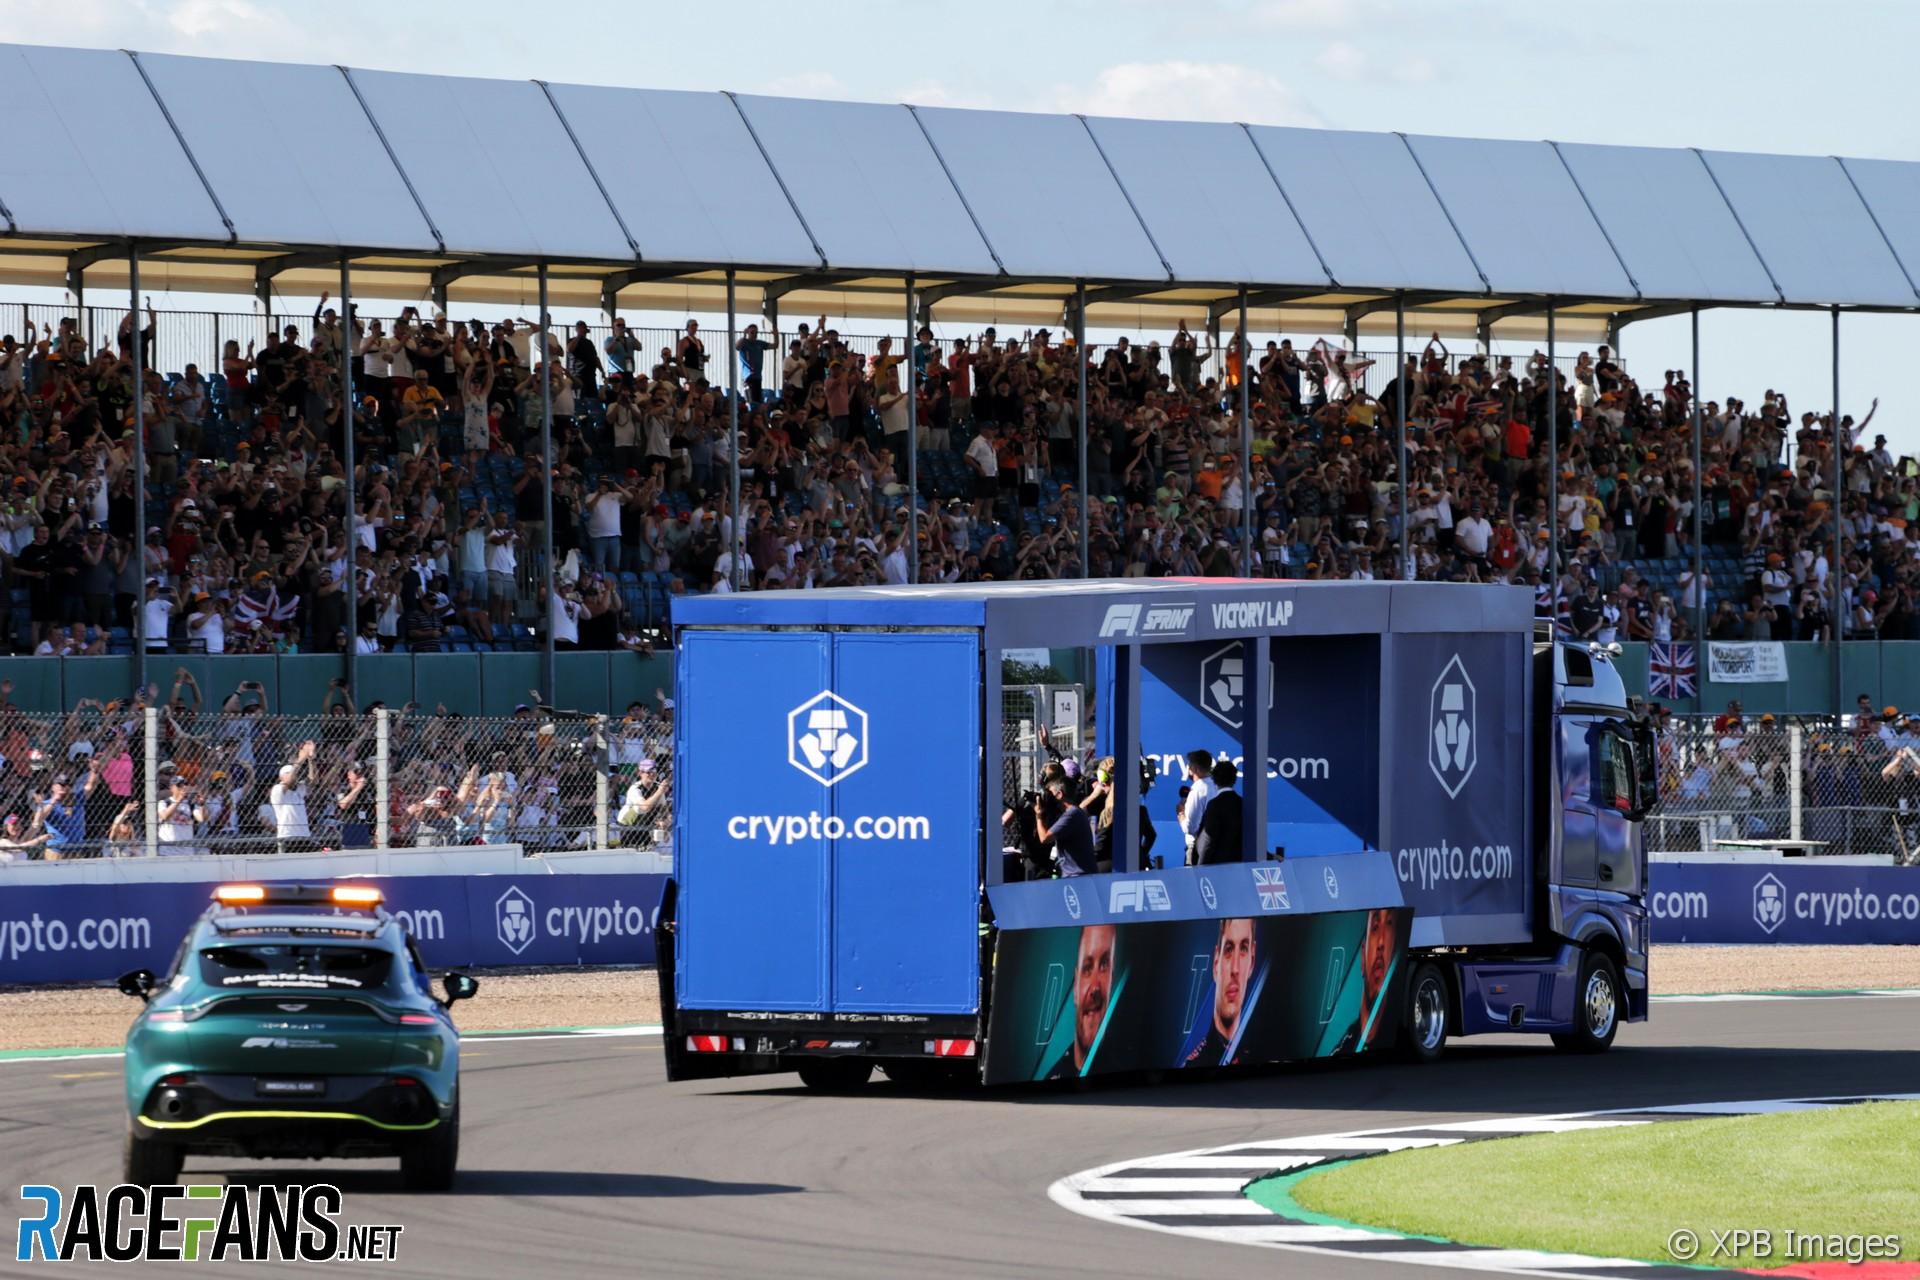 Victory lap, Silverstone, 2021